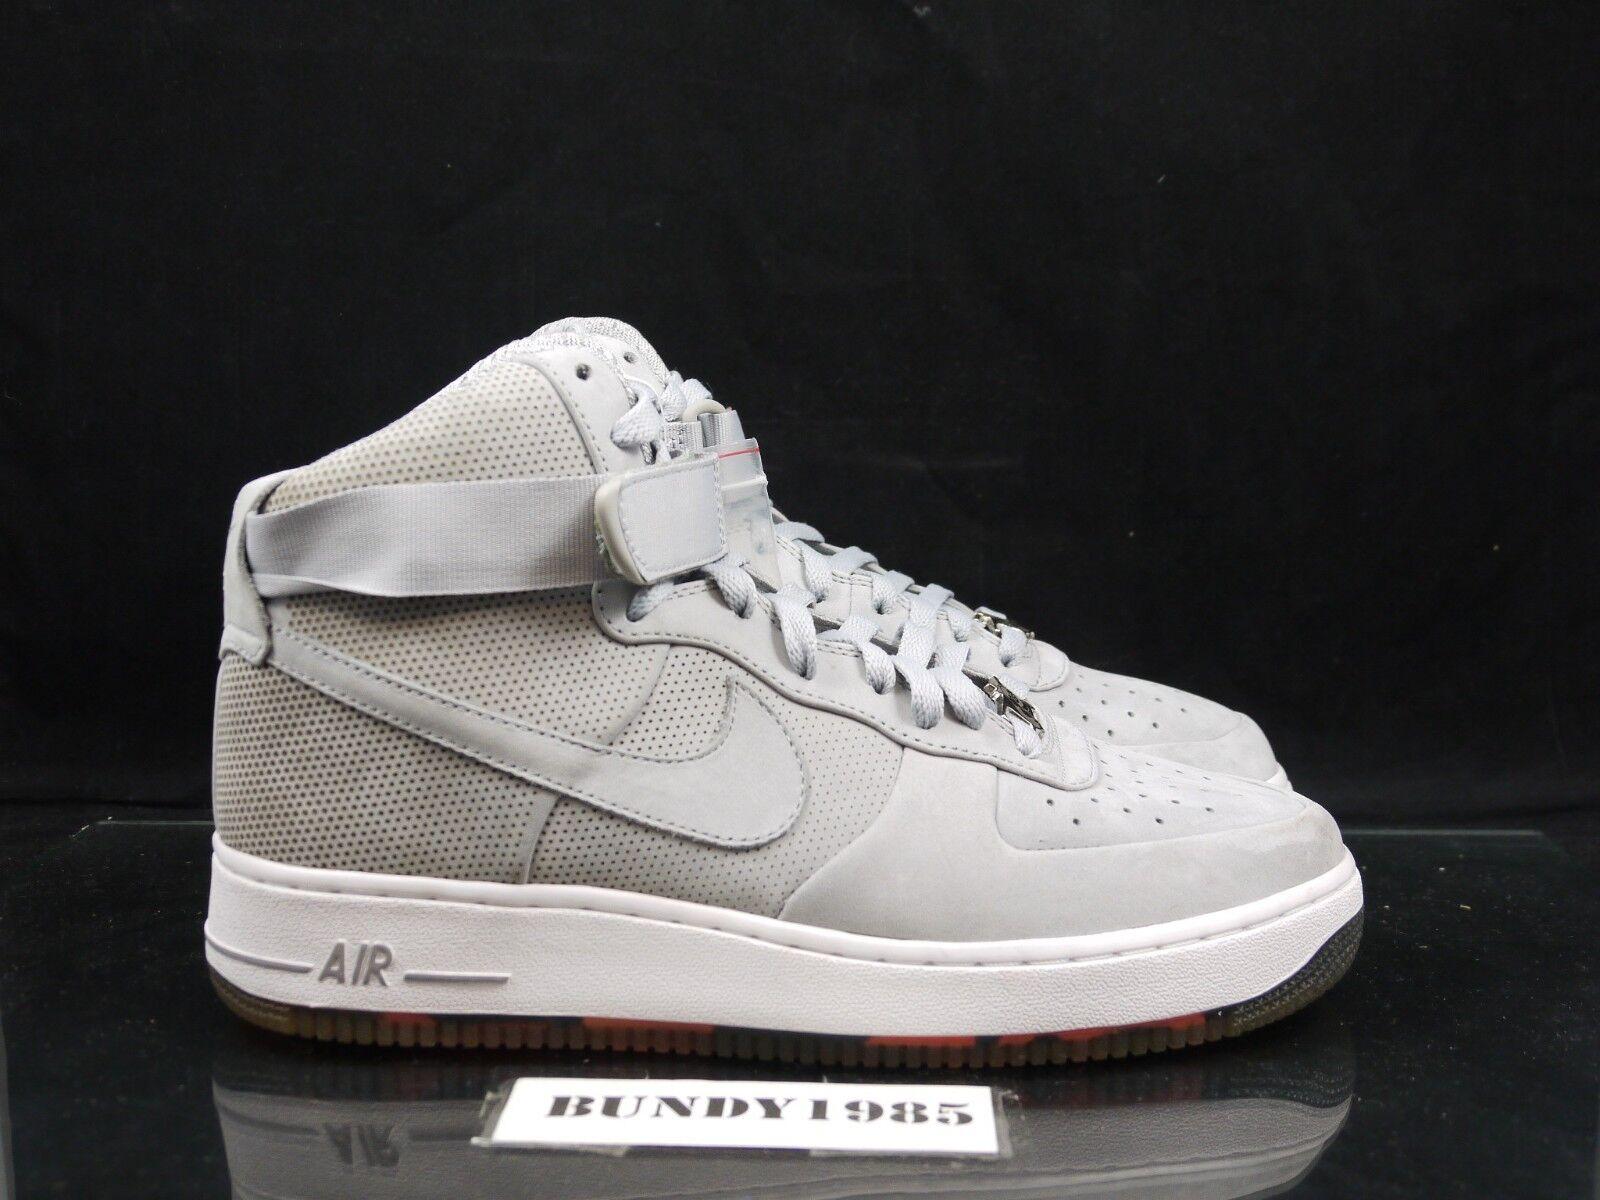 345189 001 Nike Air Force 1 High Strap Supreme Futura Grey Men's SZ 9 jordan P